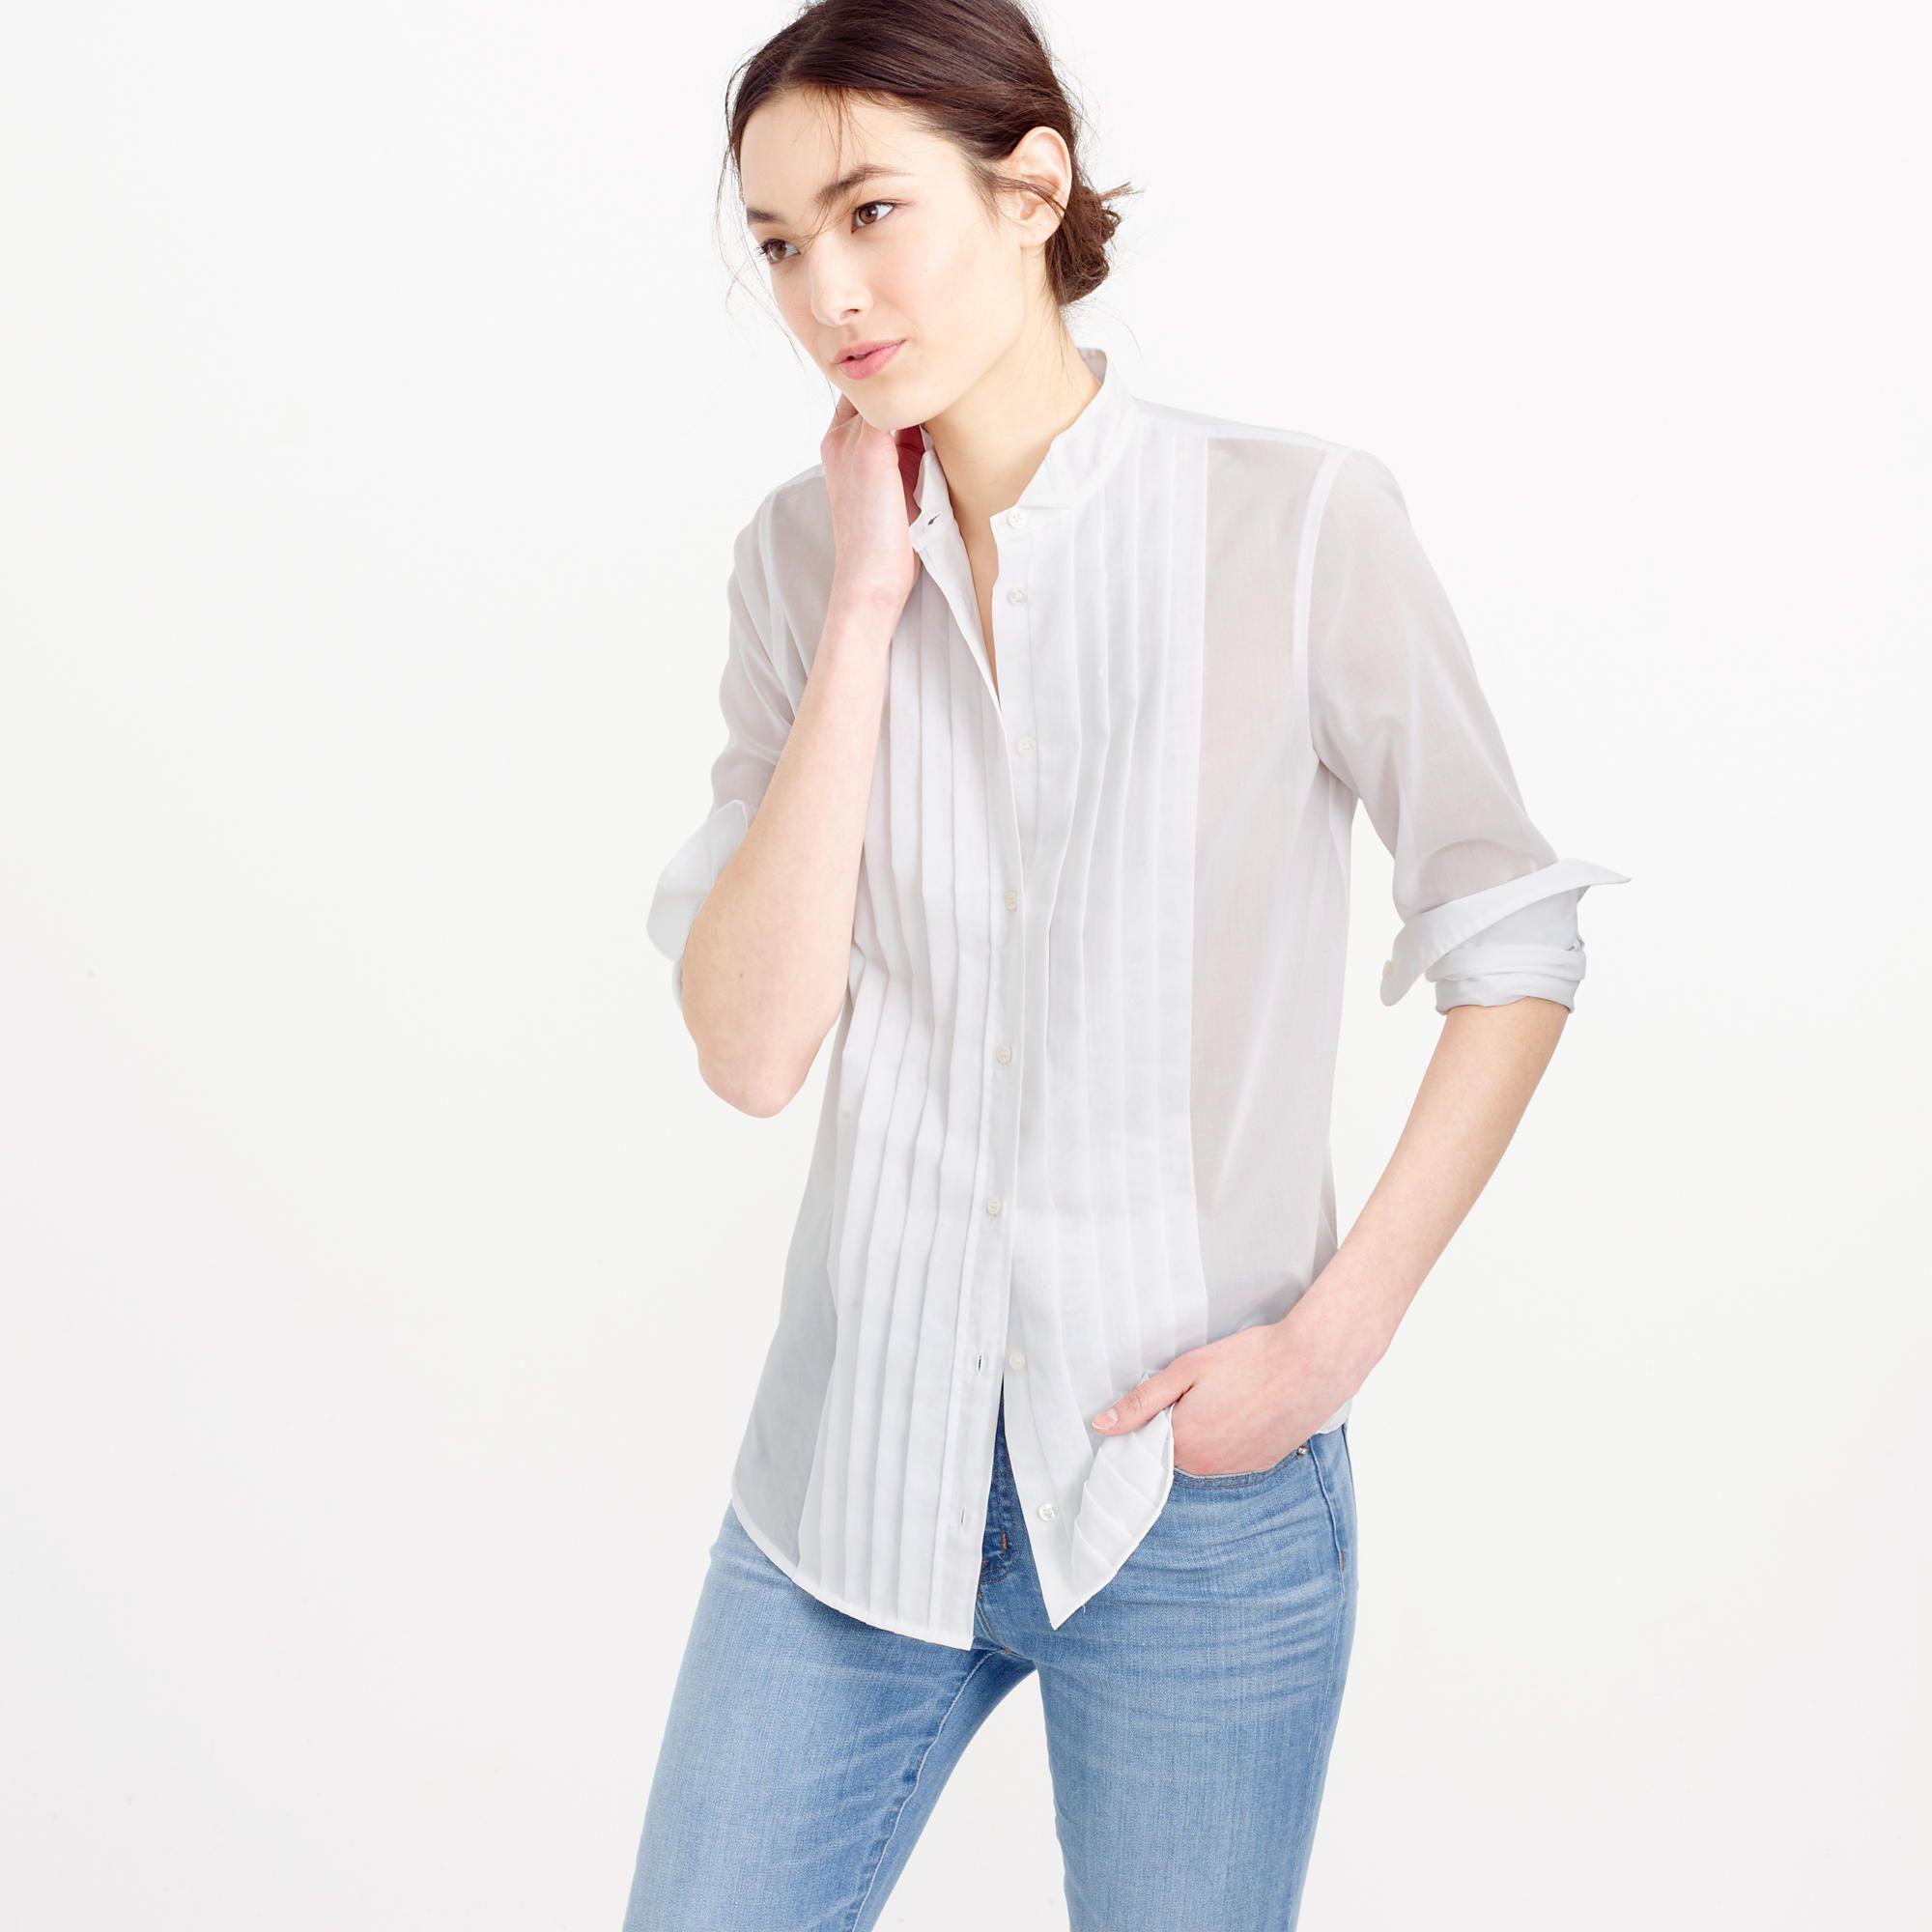 Collection Thomas Mason Tuxedo Shirt In Cotton Voile   Women s Shirts  87d3102044